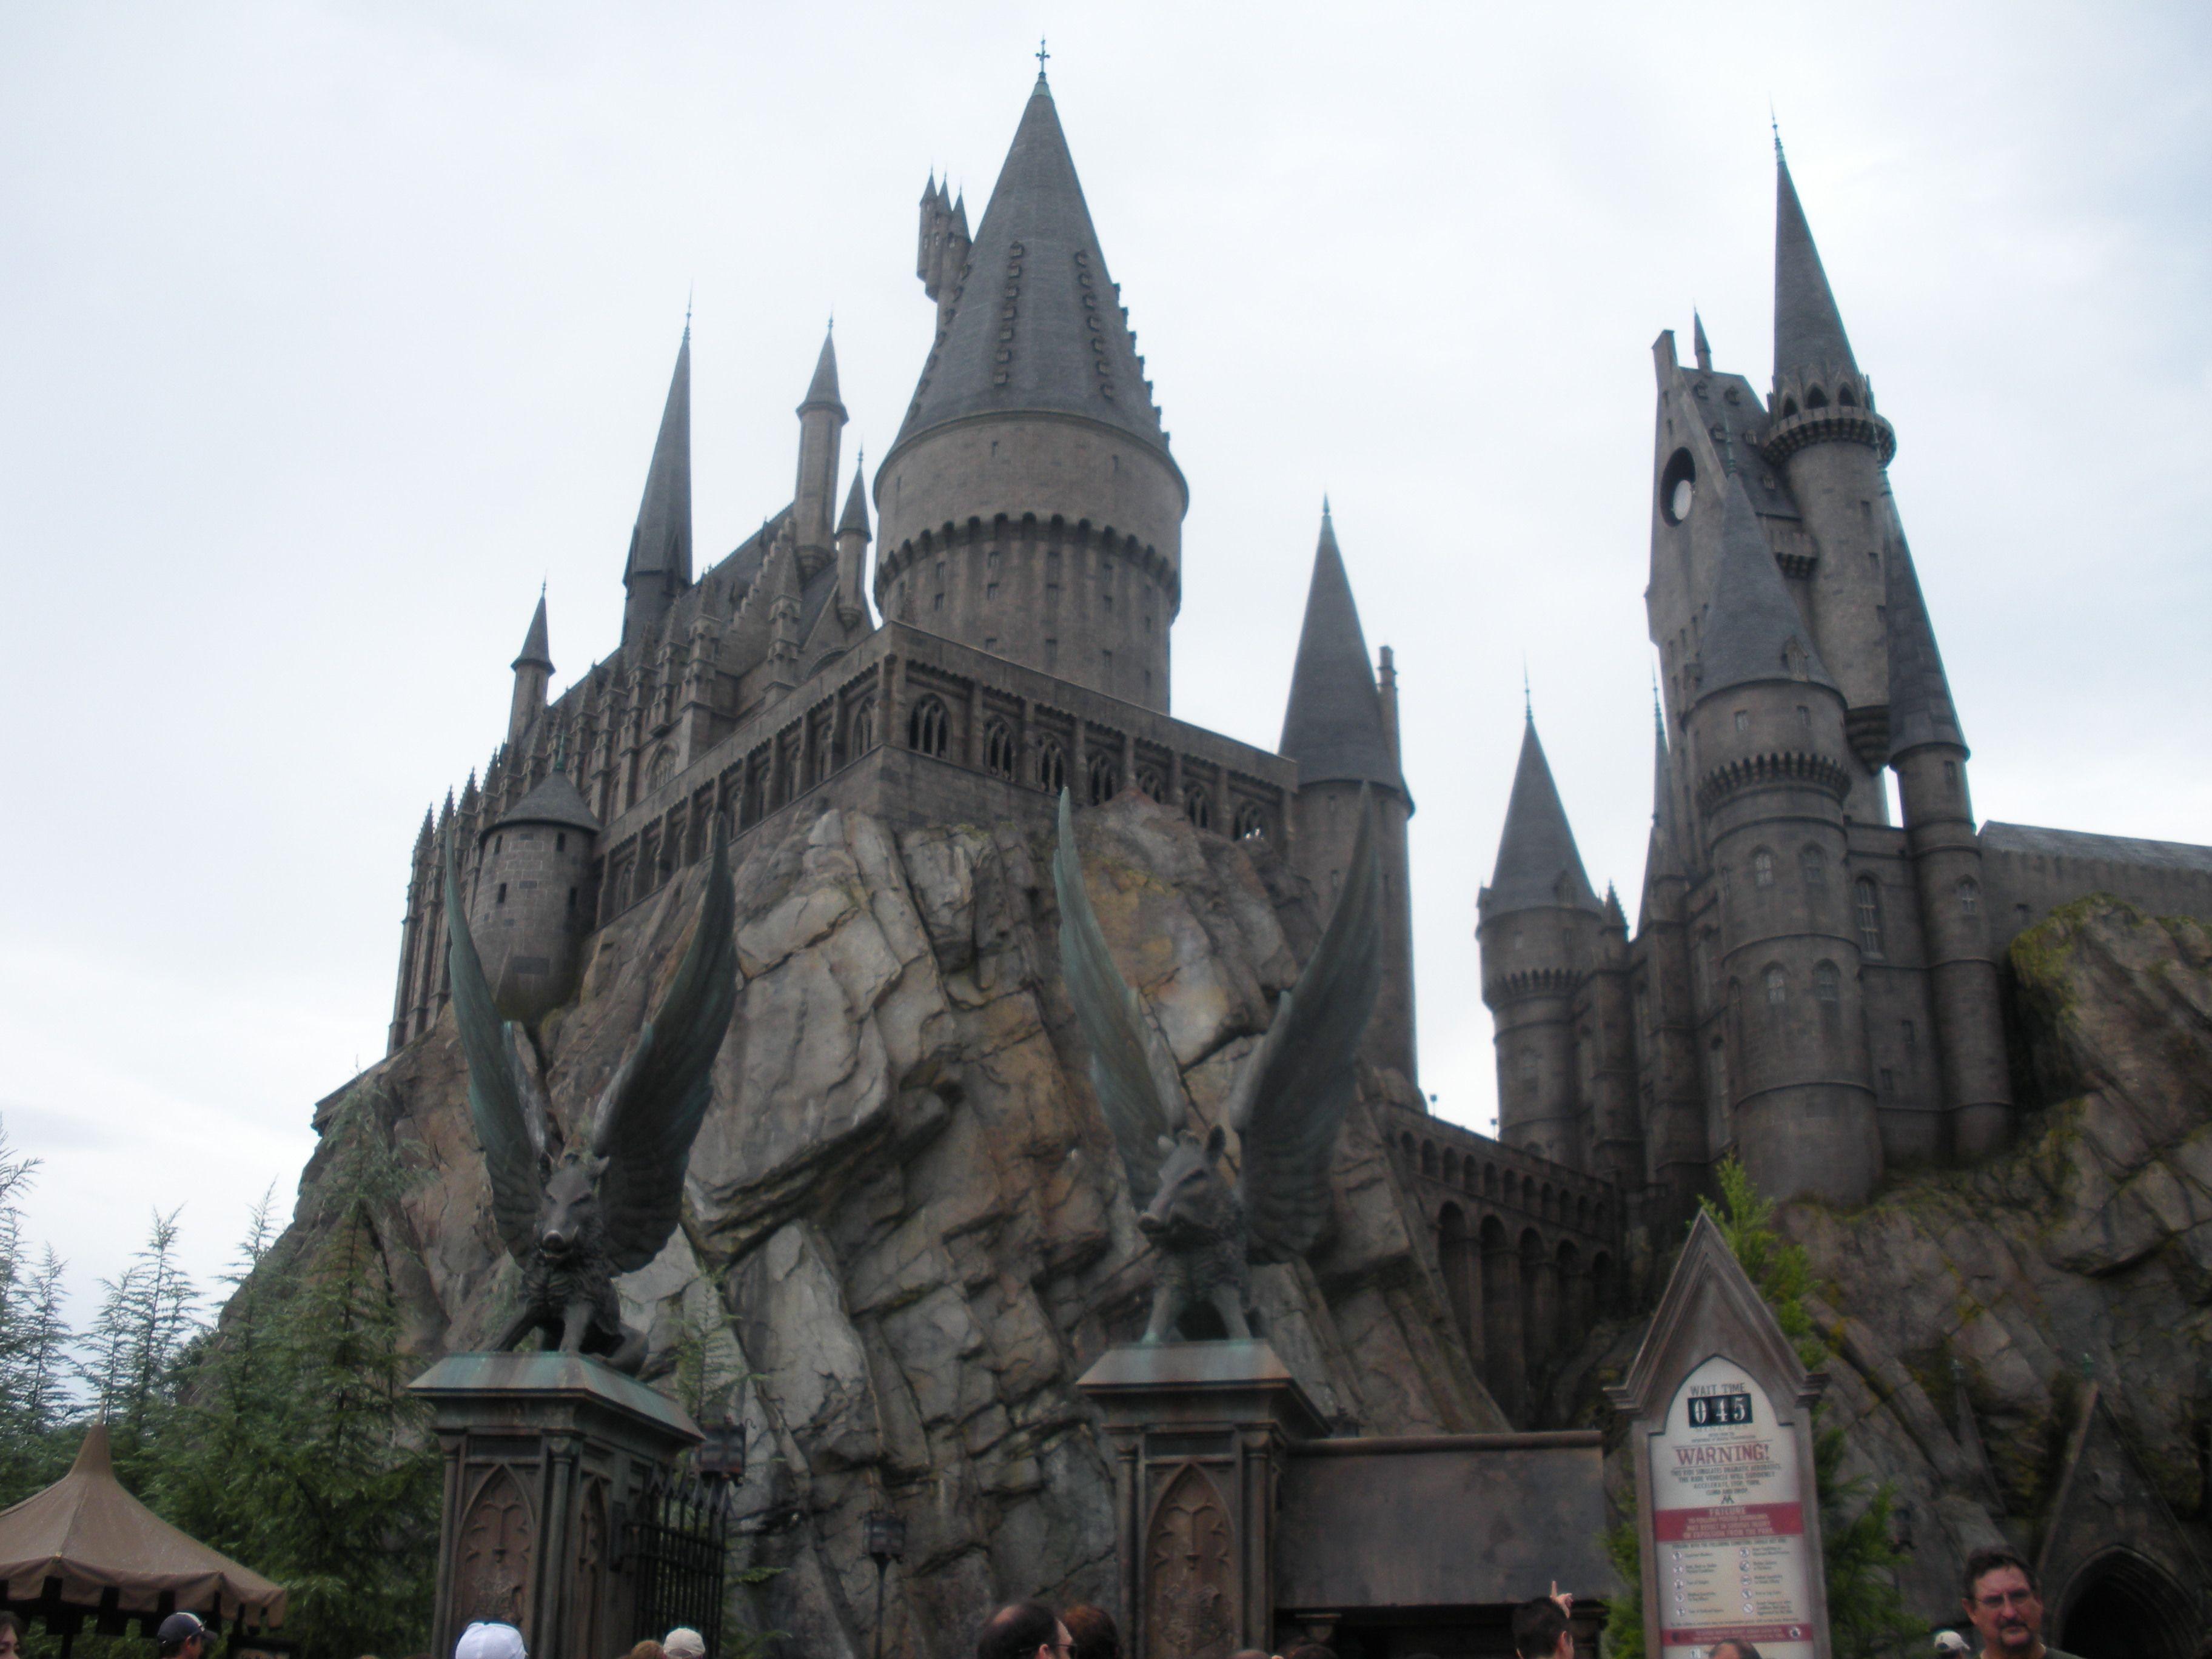 Hogwarts Castle Wizarding World Of Harry Potter Universal Studios Harry Potter Healthy Meal Delivery Service Hogwarts Castle